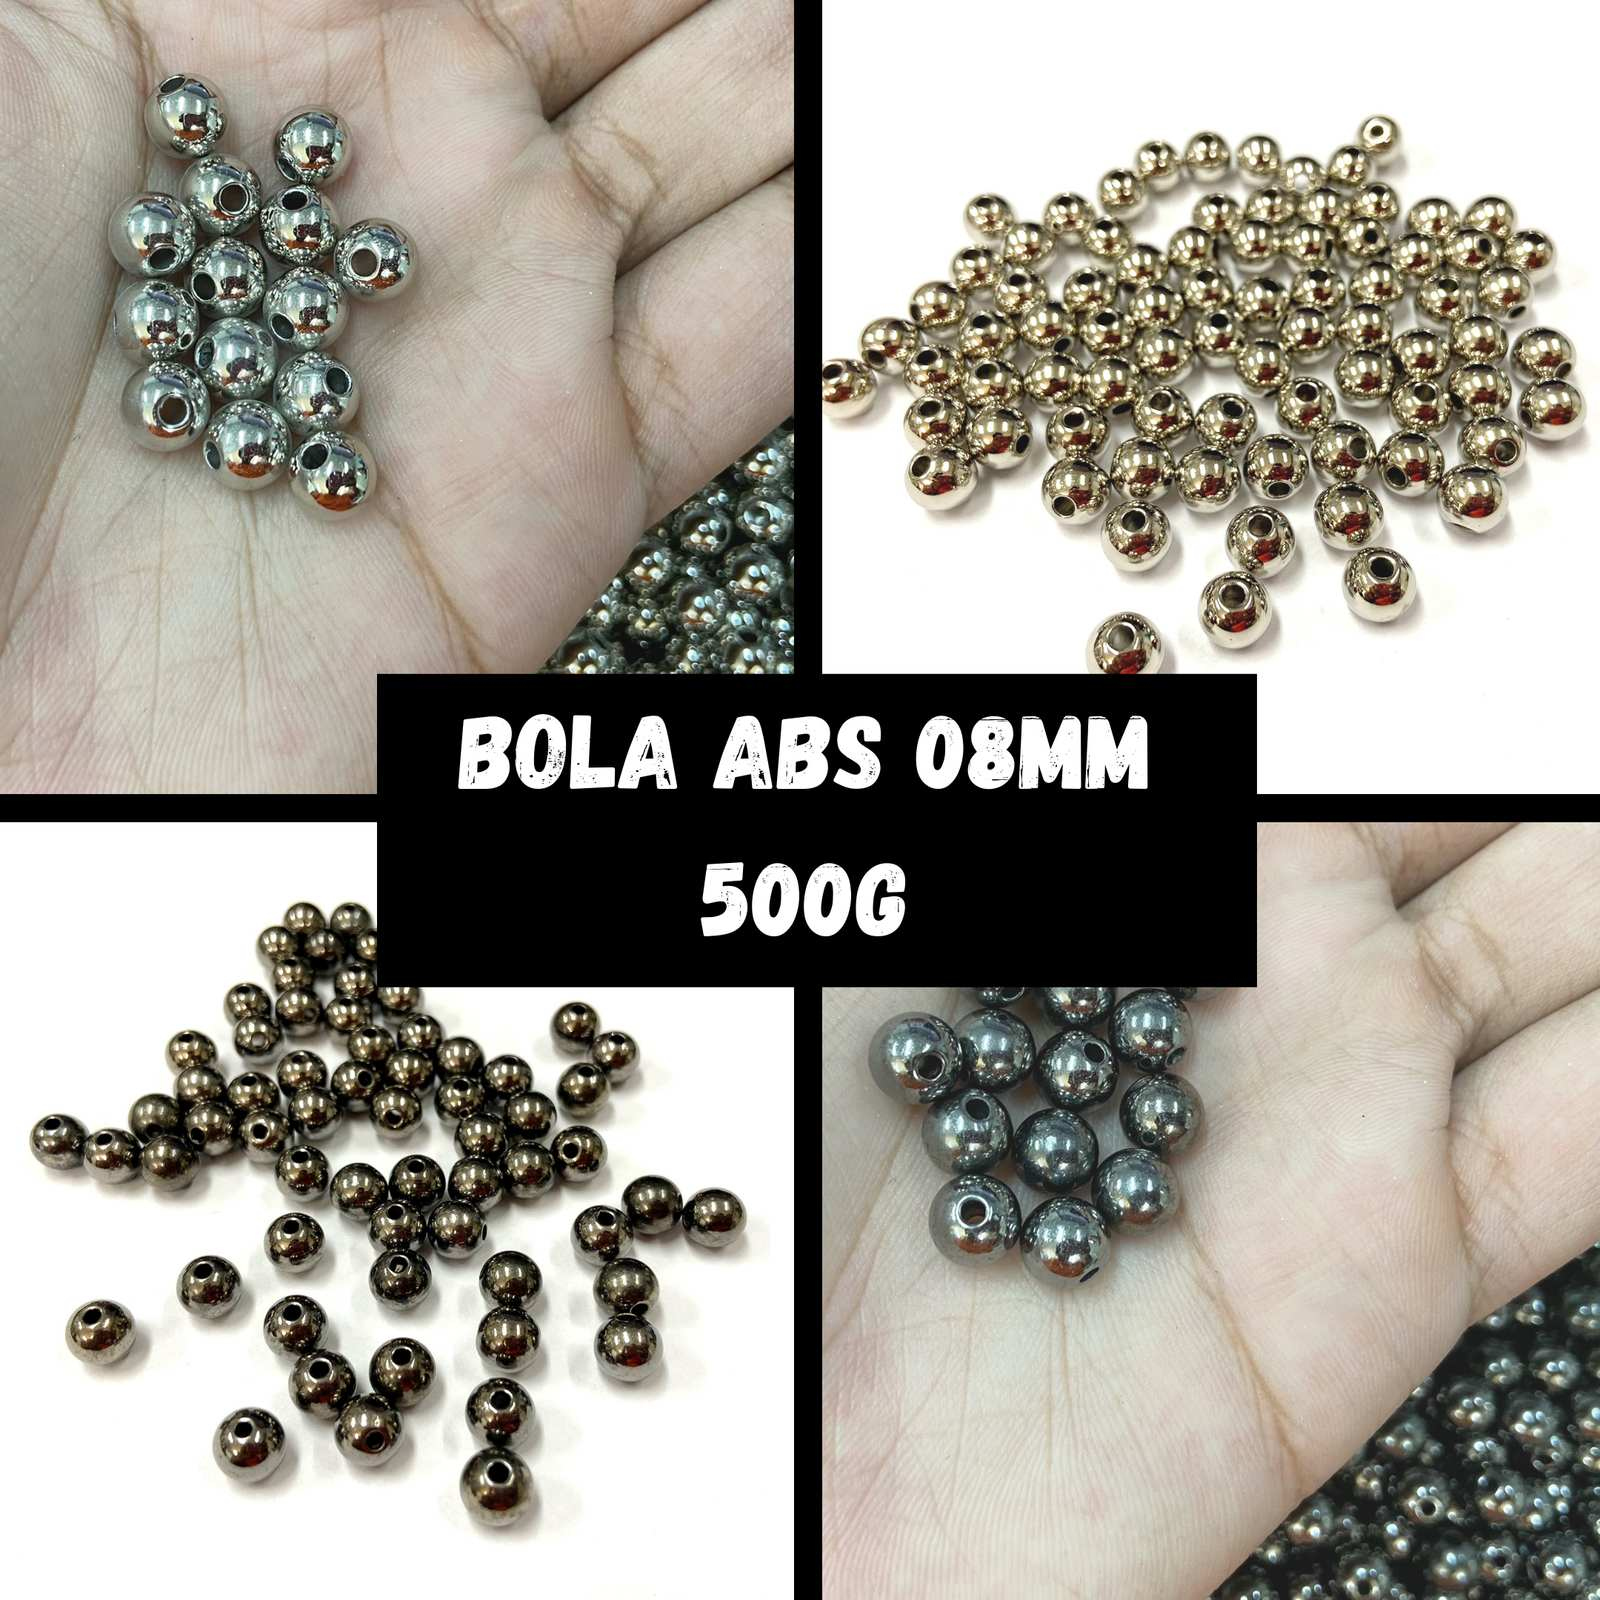 Bola ABS Metalizada 08mm - 500g